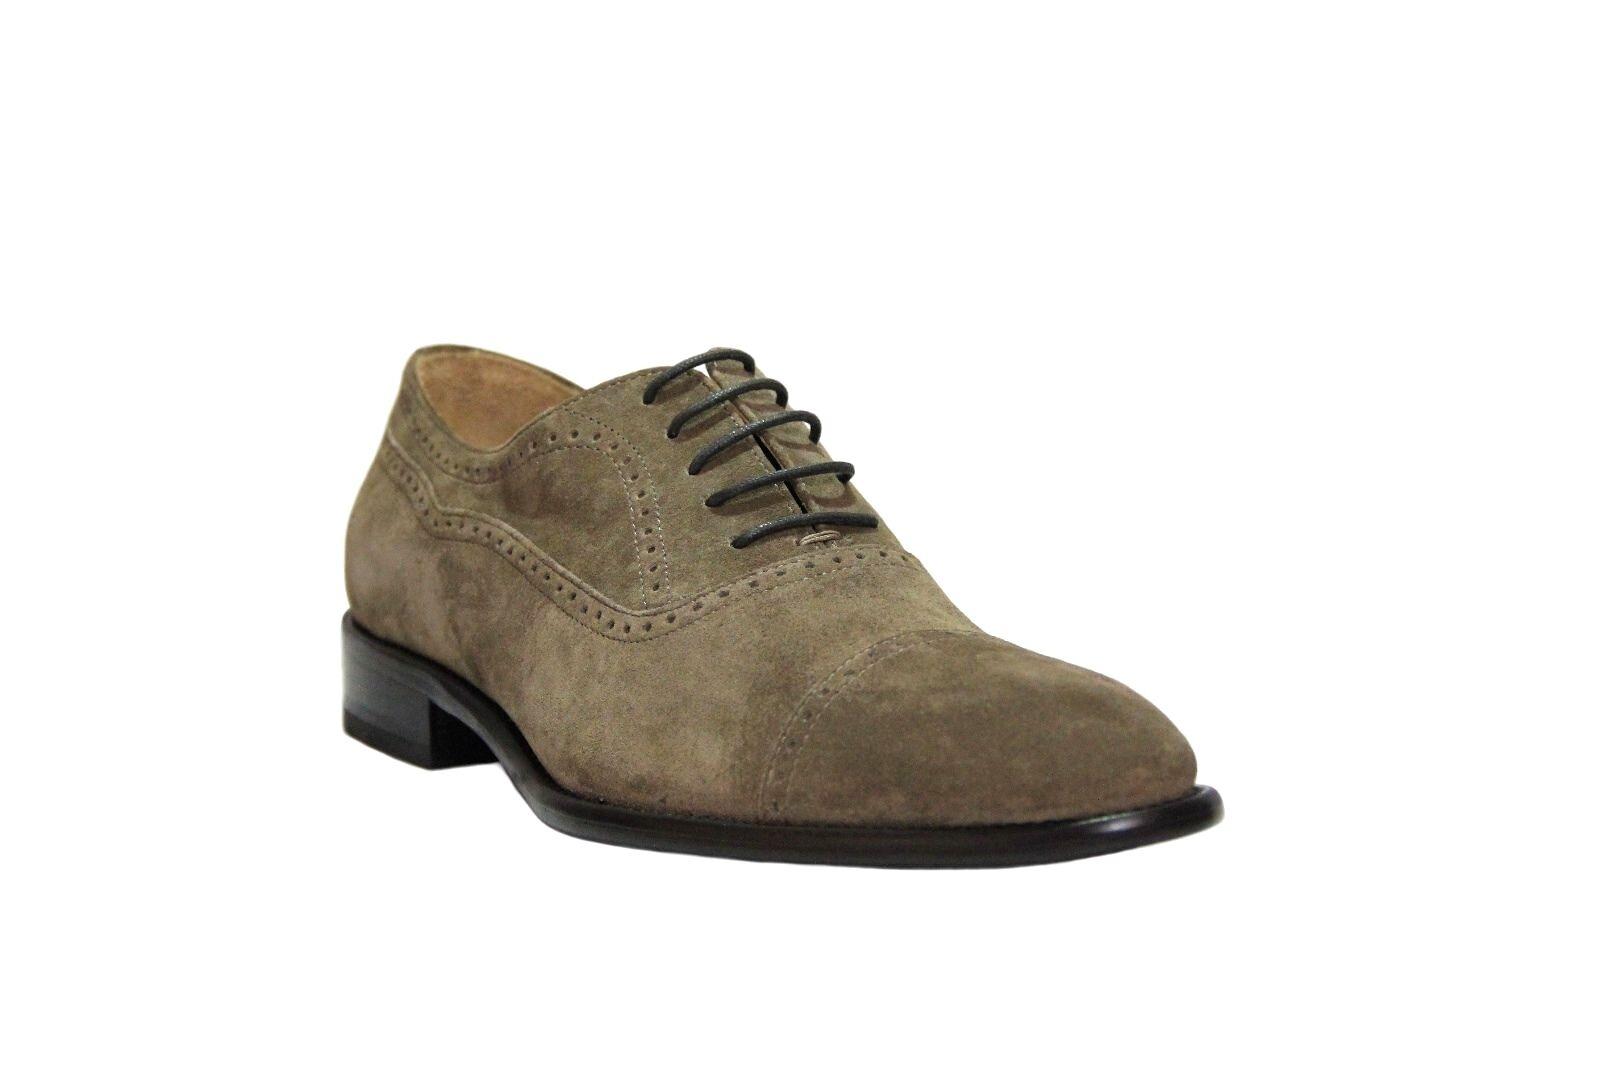 Calzoleria Toscana Men's Oxford Taupe Suede Cup Toe Dress shoes E215